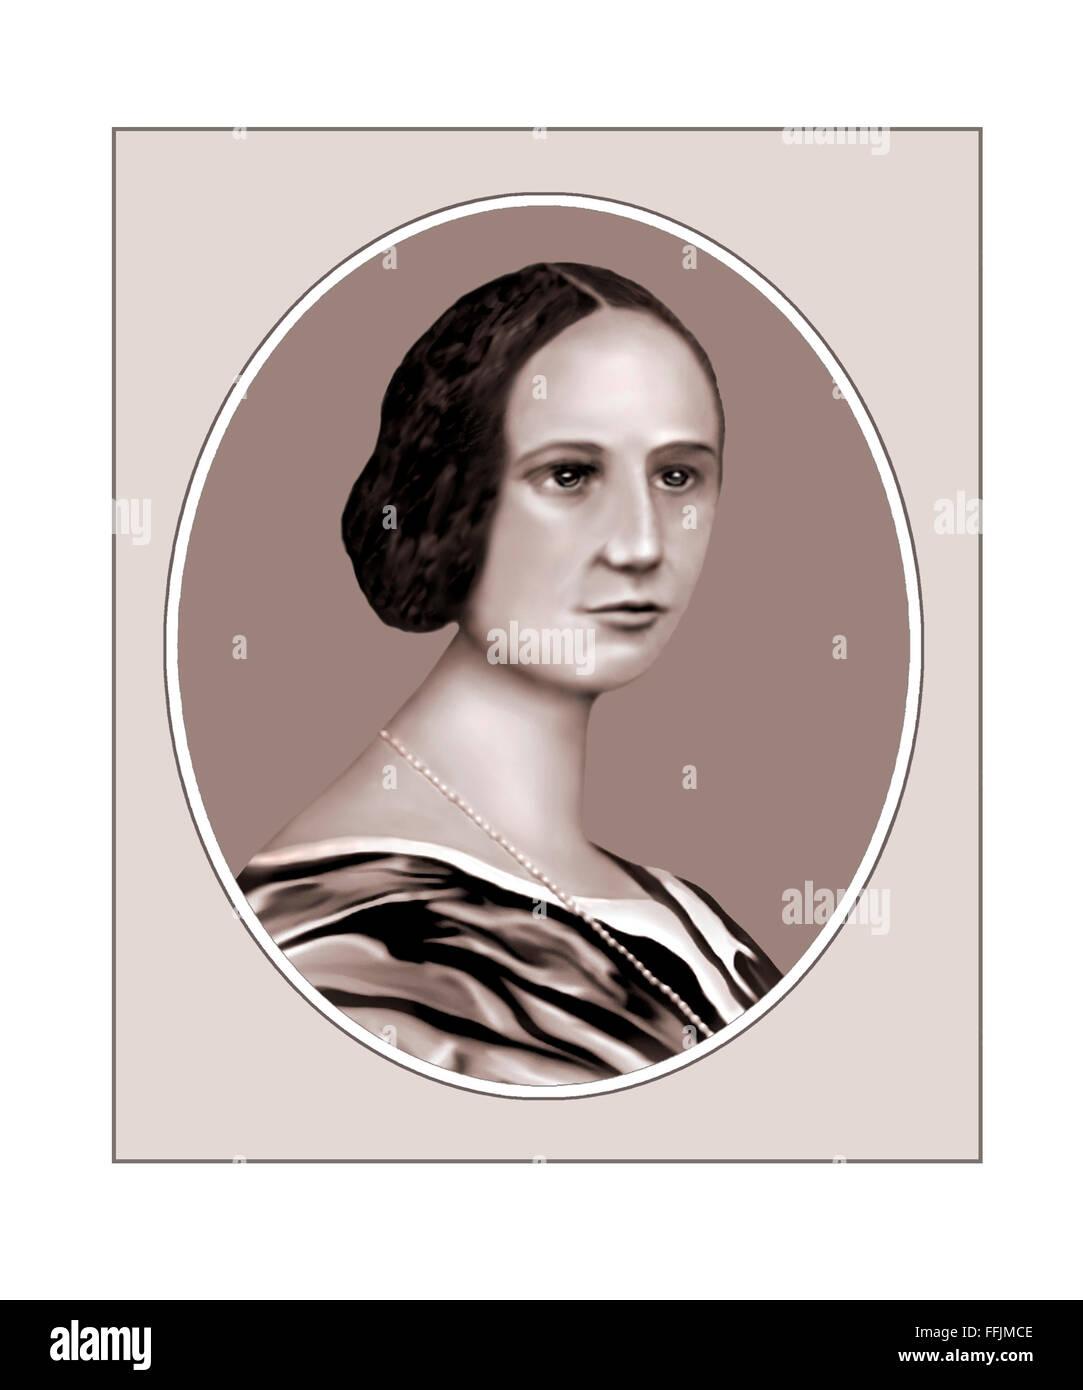 Ada Lovelace, Mathematician, Portrait - Stock Image